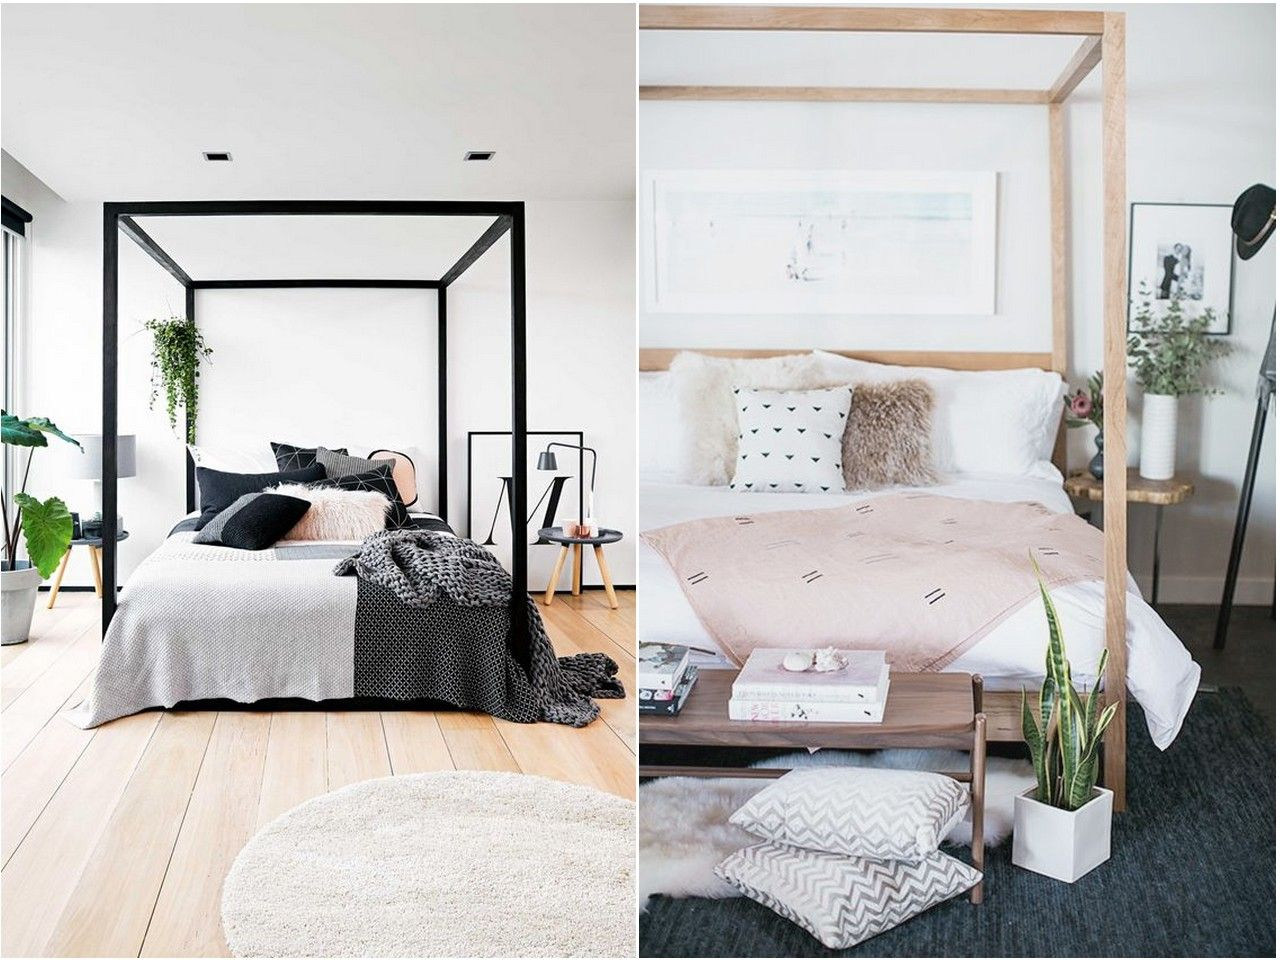 Cabeceros tapizados para tu dormitorio ideas para for Decoracion interiores dormitorios